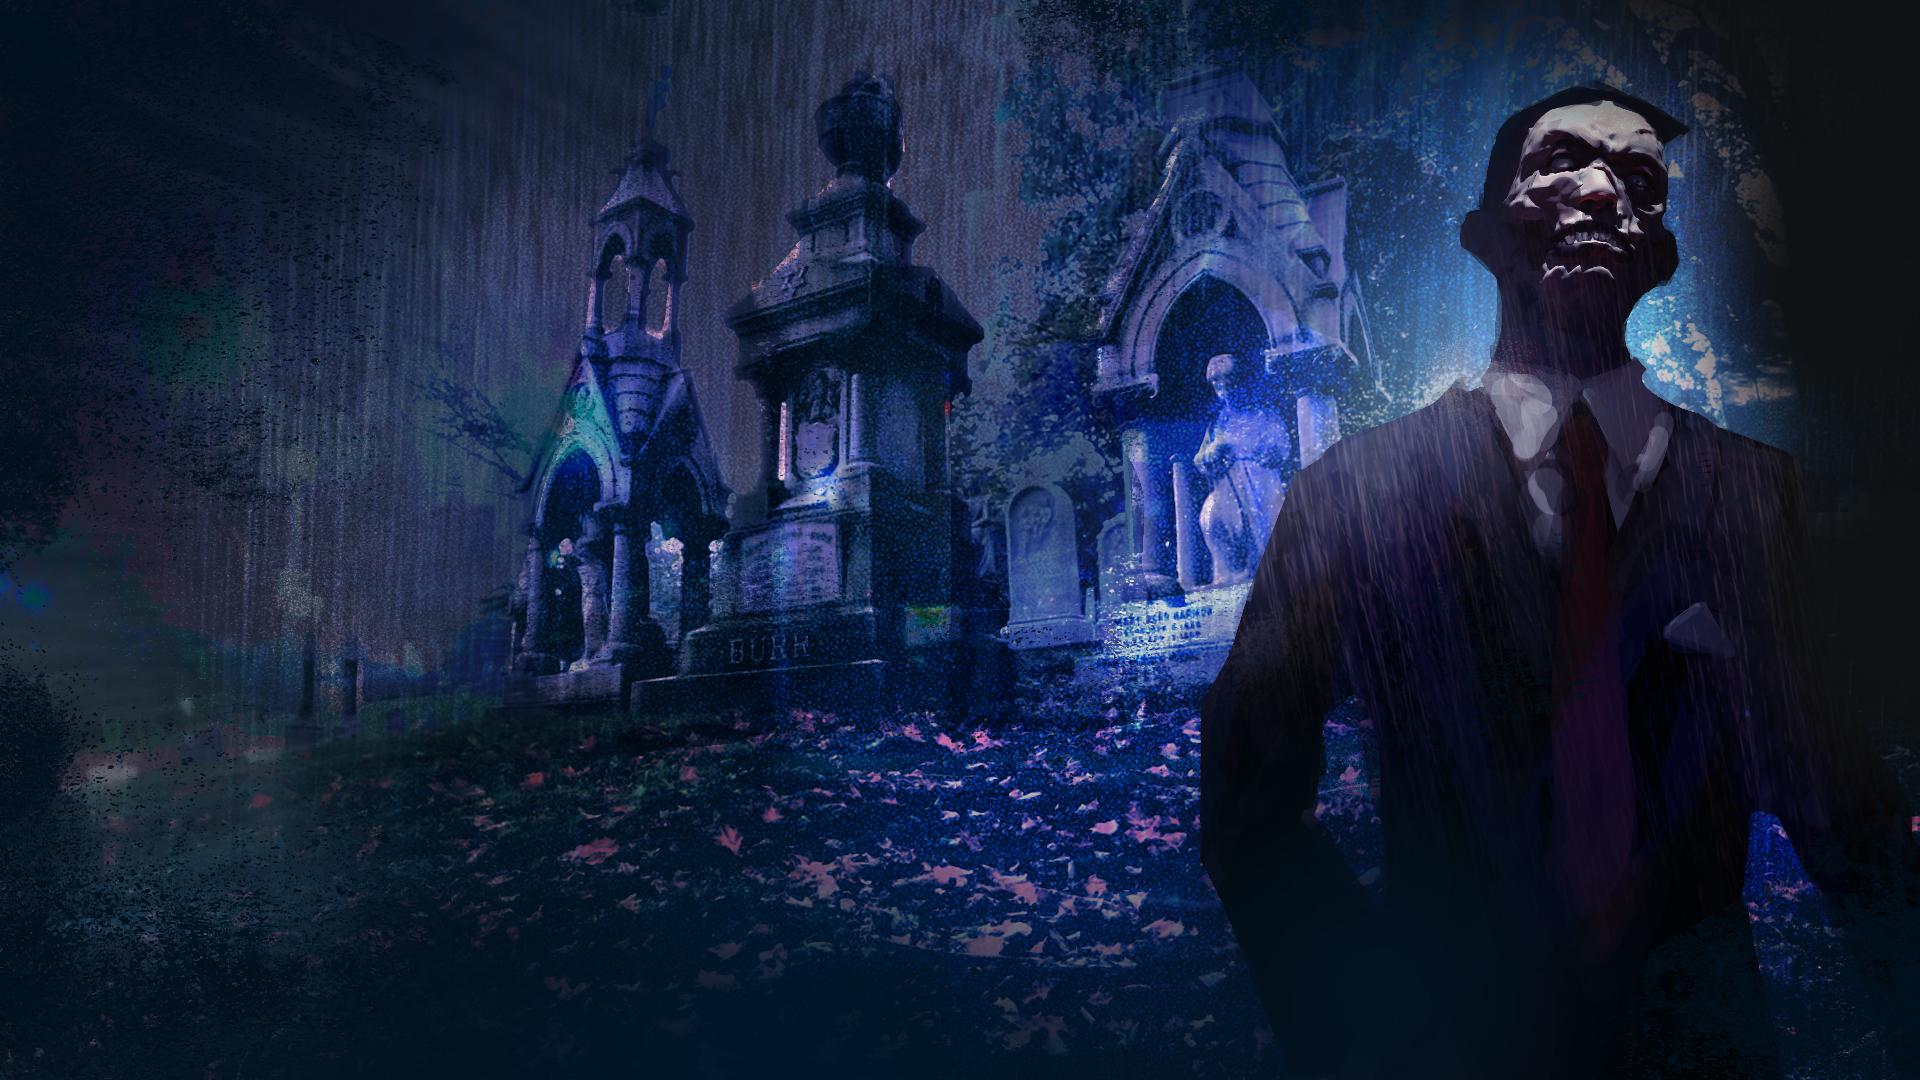 World of Darkness - Vampire: The Masquerade - Coteries of New York